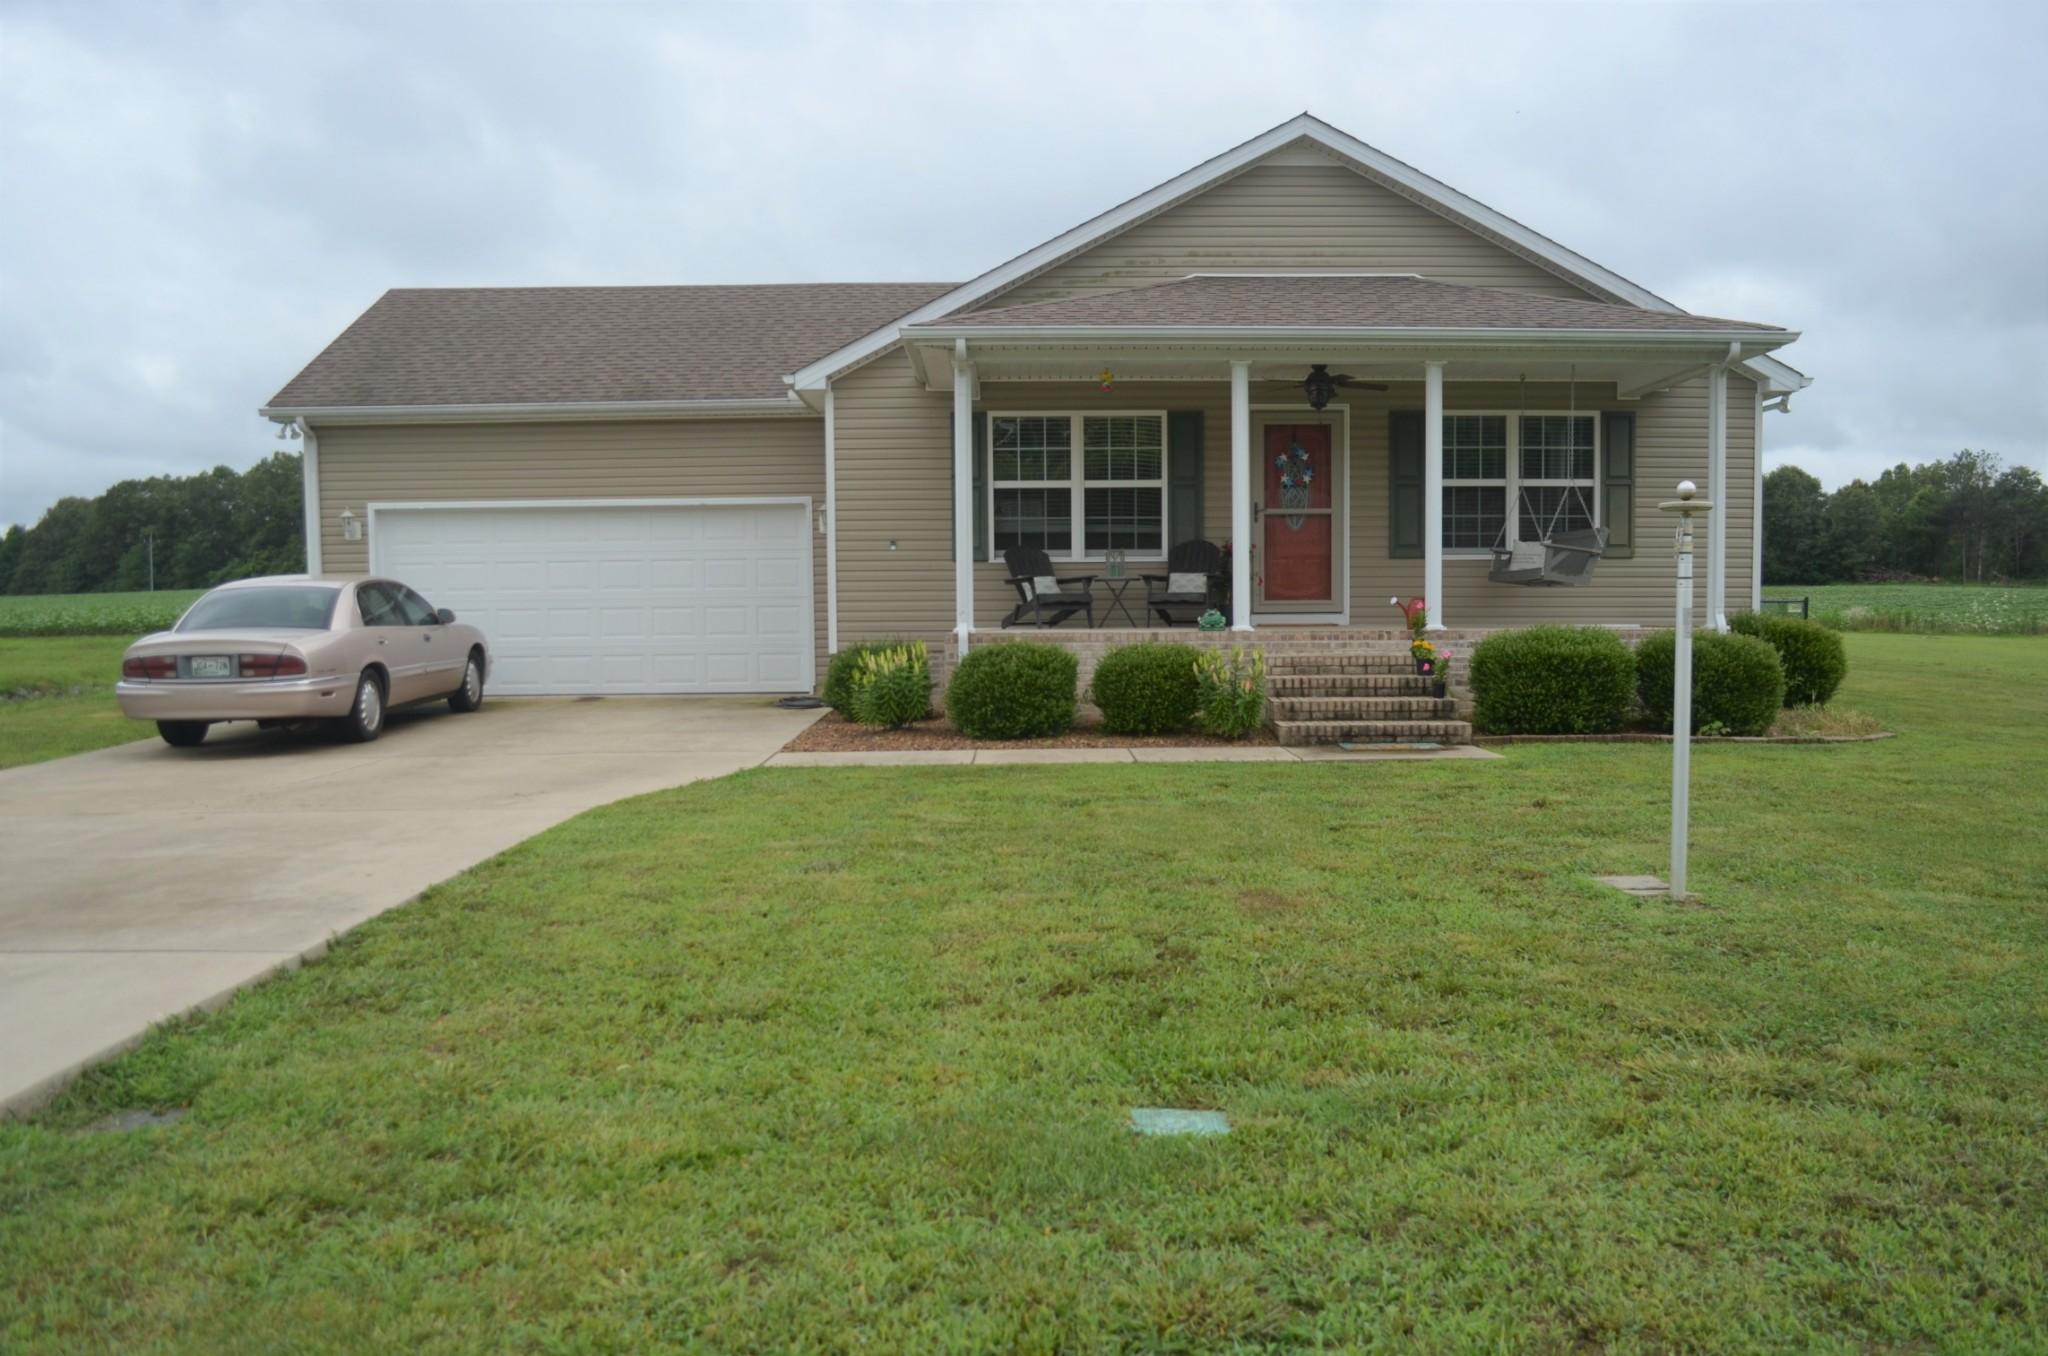 133 ELISE CIRCLE Property Photo - Tullahoma, TN real estate listing